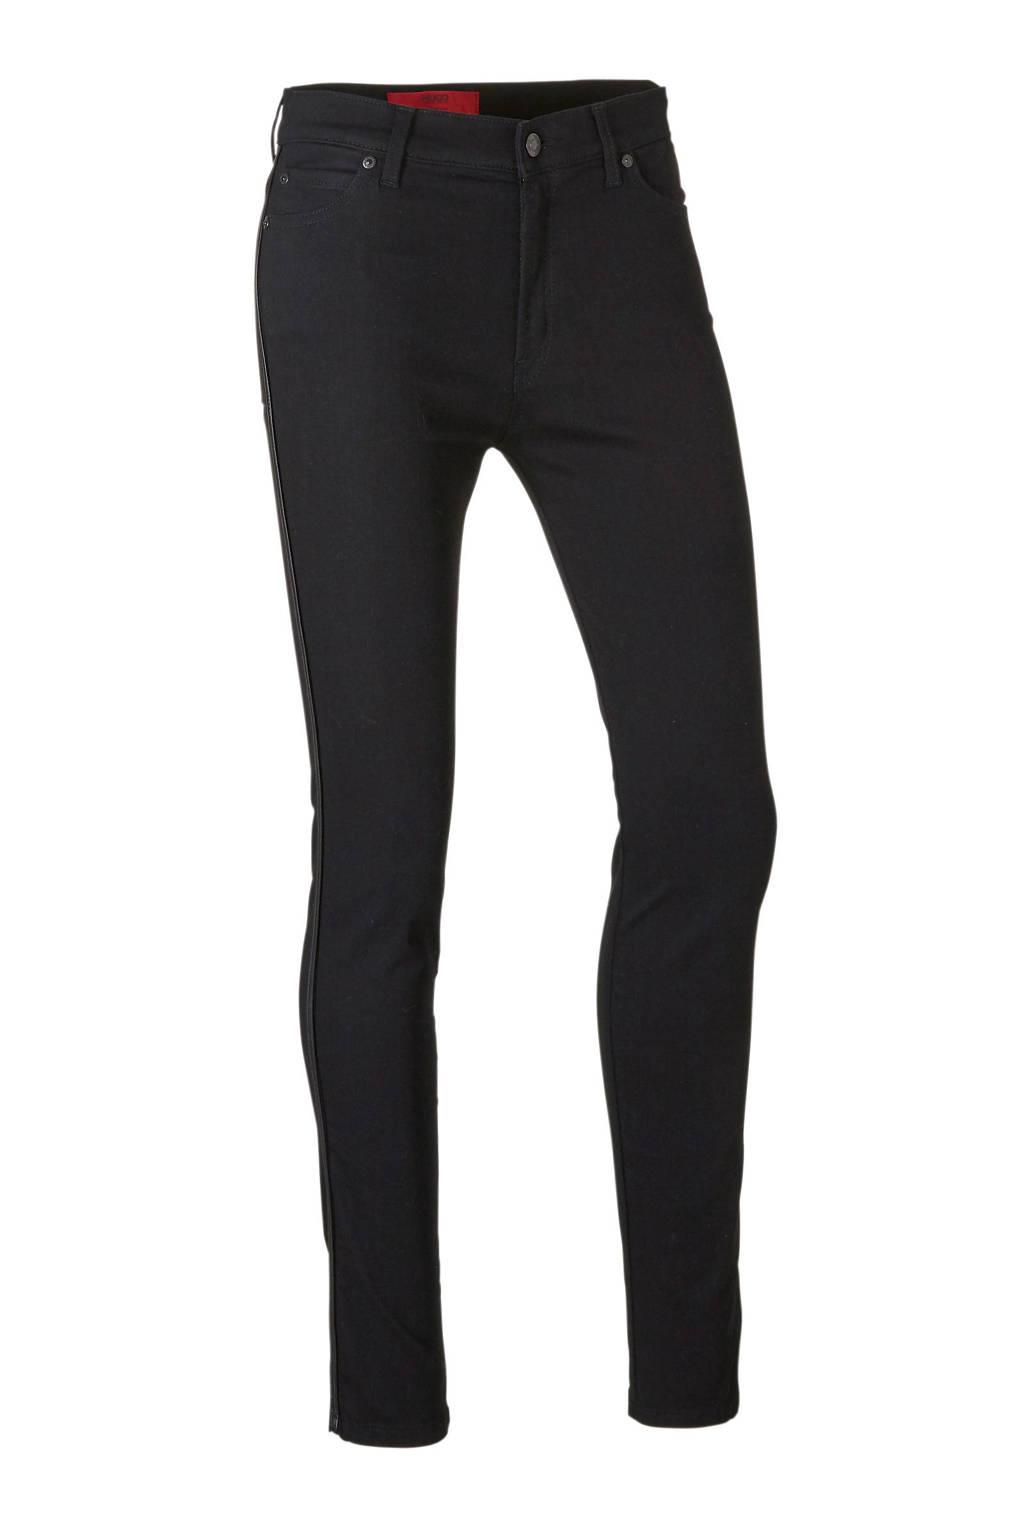 HUGO skinny jeans zwart, Zwart